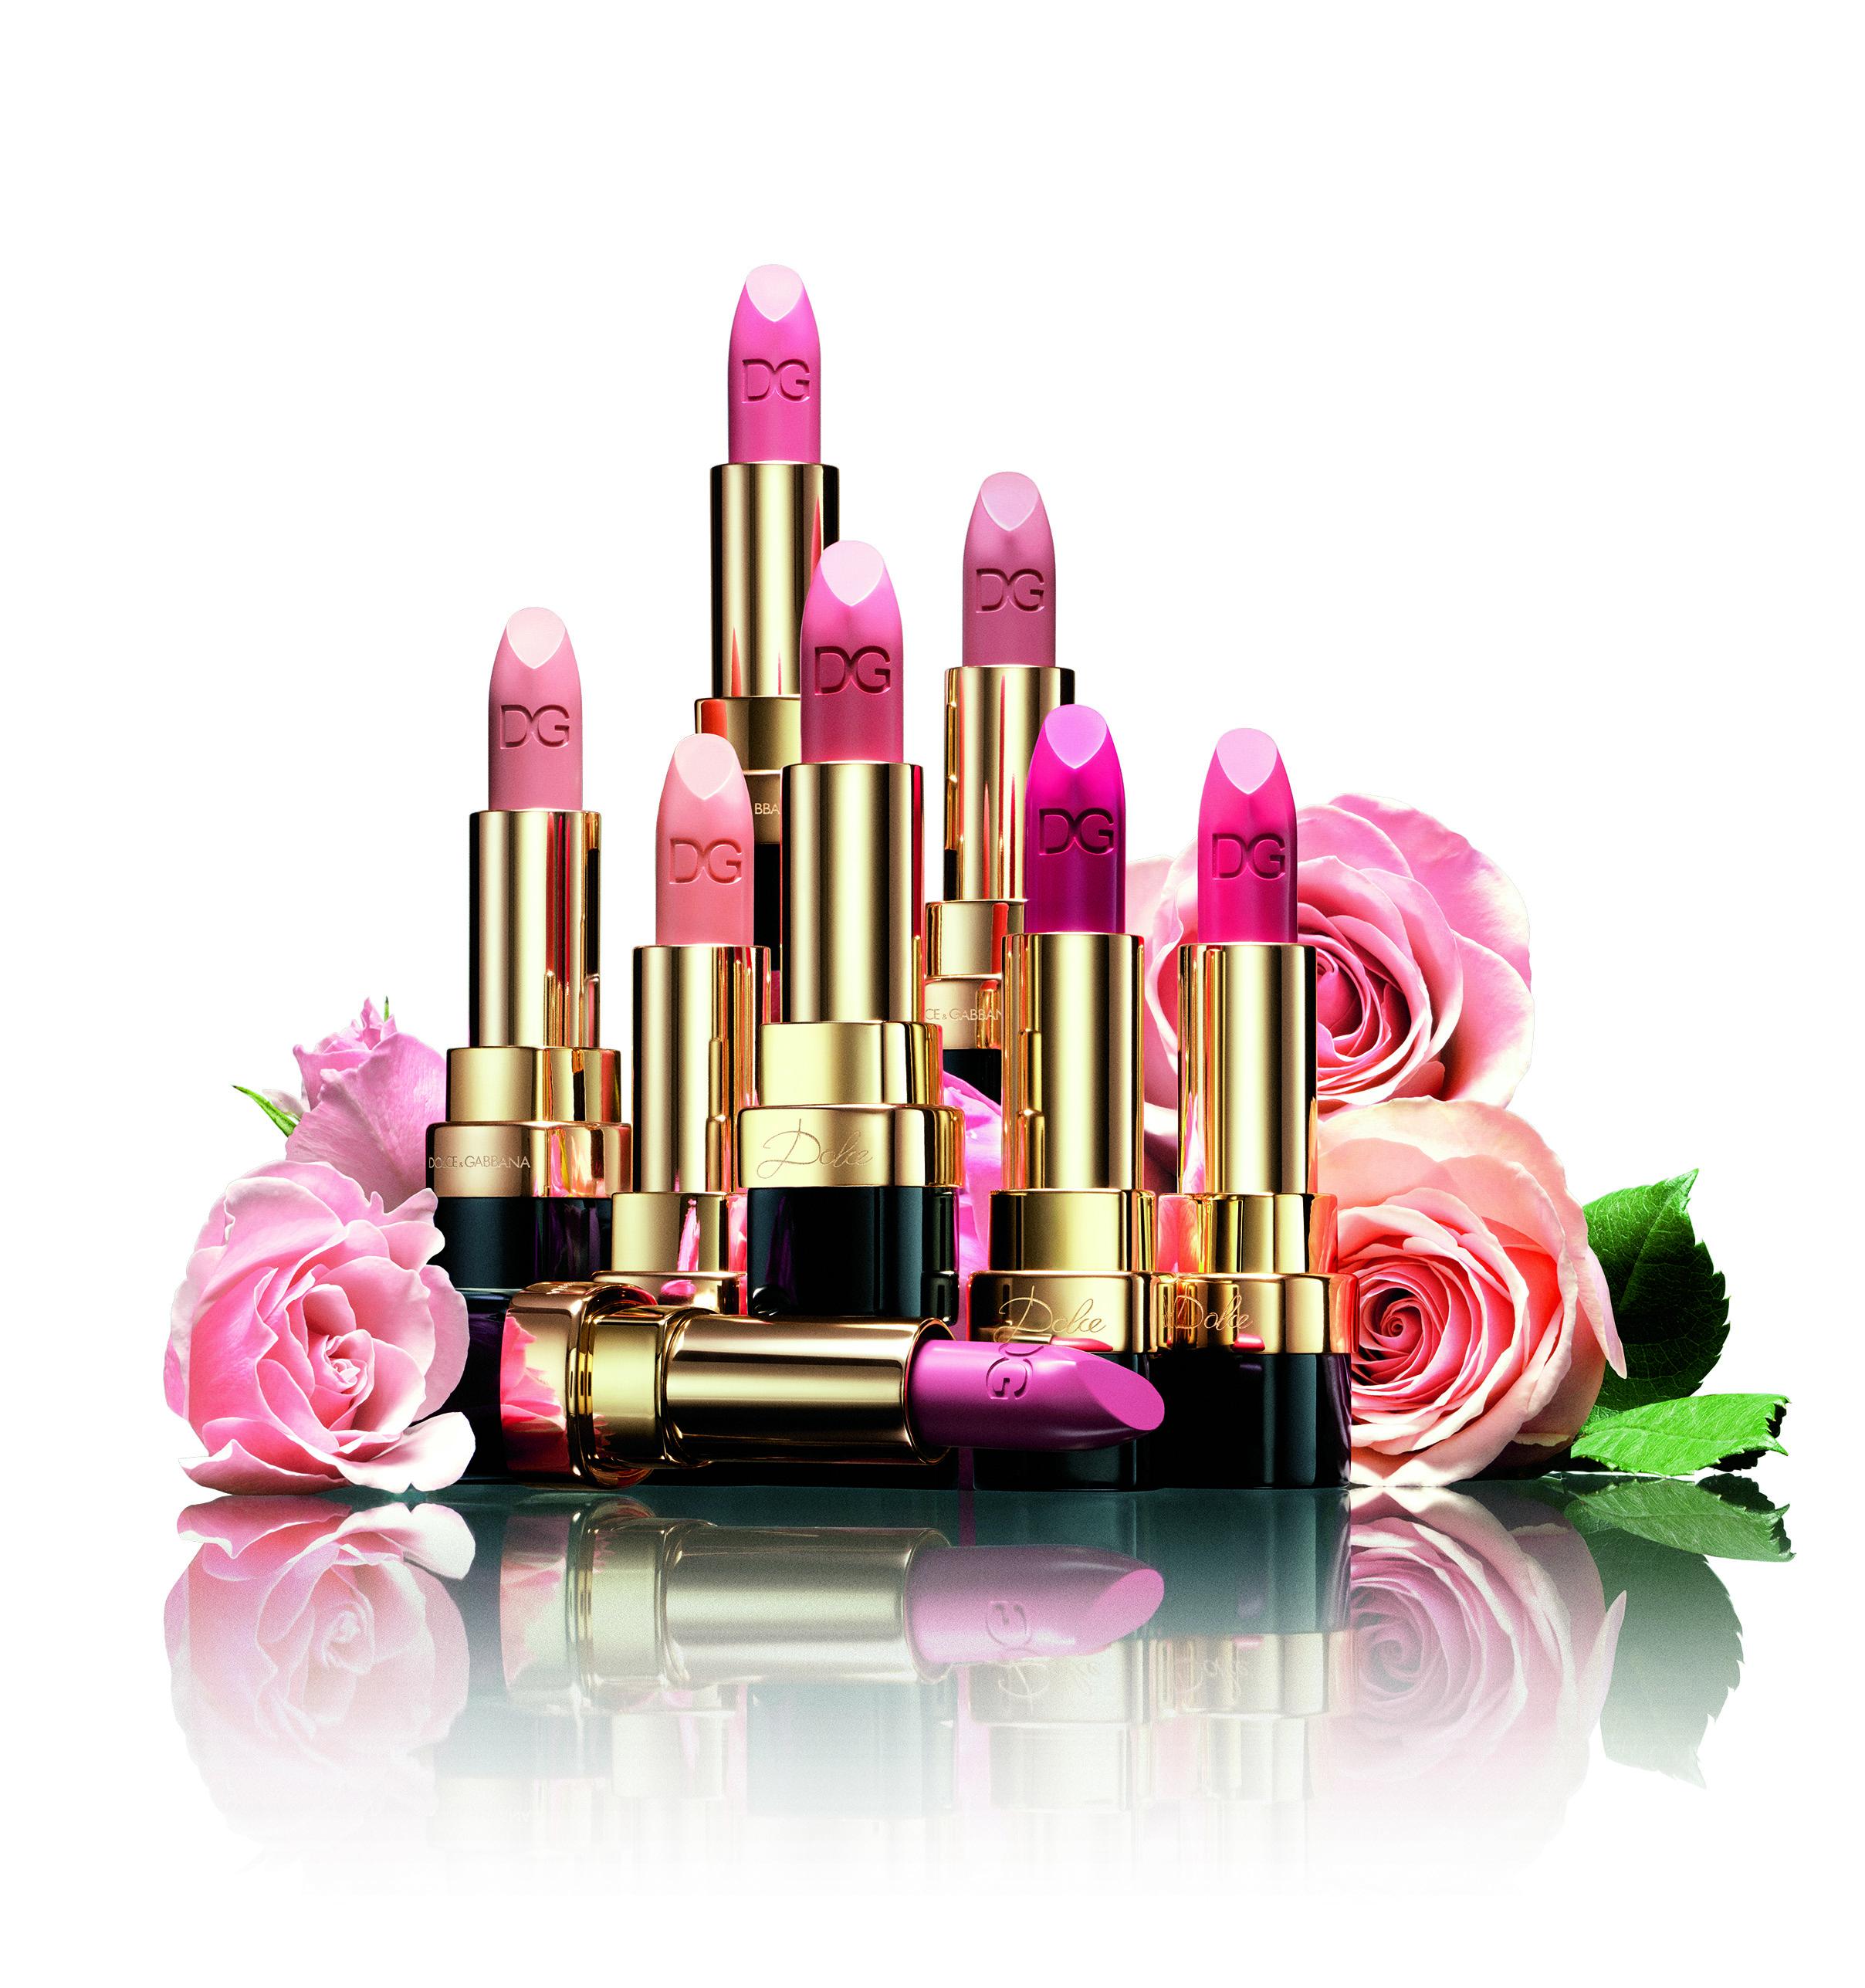 6ac2044dad3 Dolce Matte Lipstick. Download High-resolution Image1731KB. DOLCE&GABBANA  Sales Counter